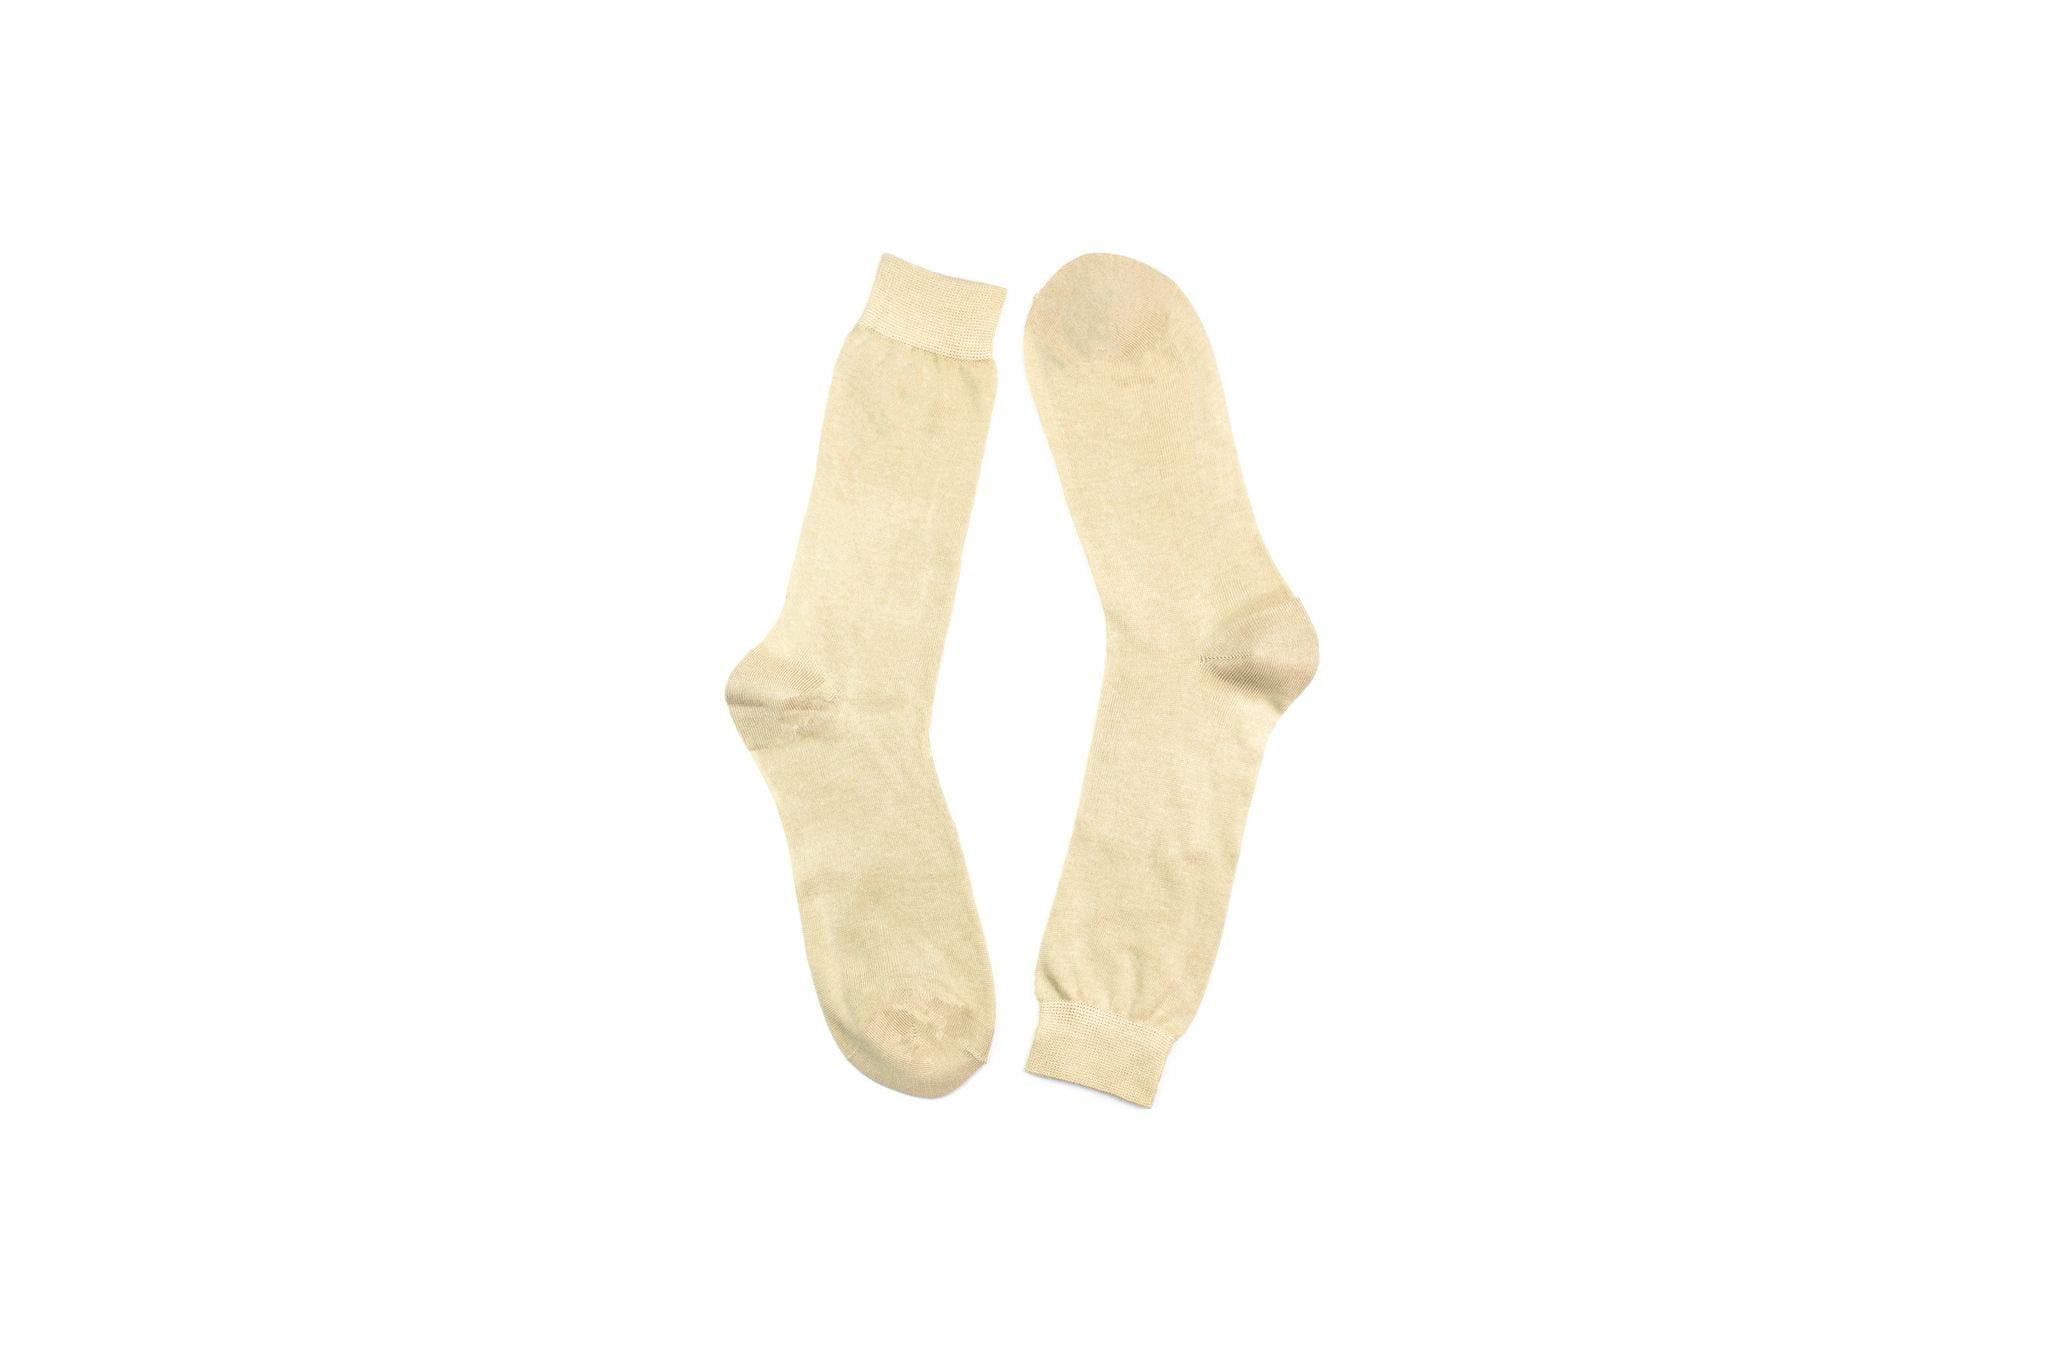 Moody Socks trial 1-405